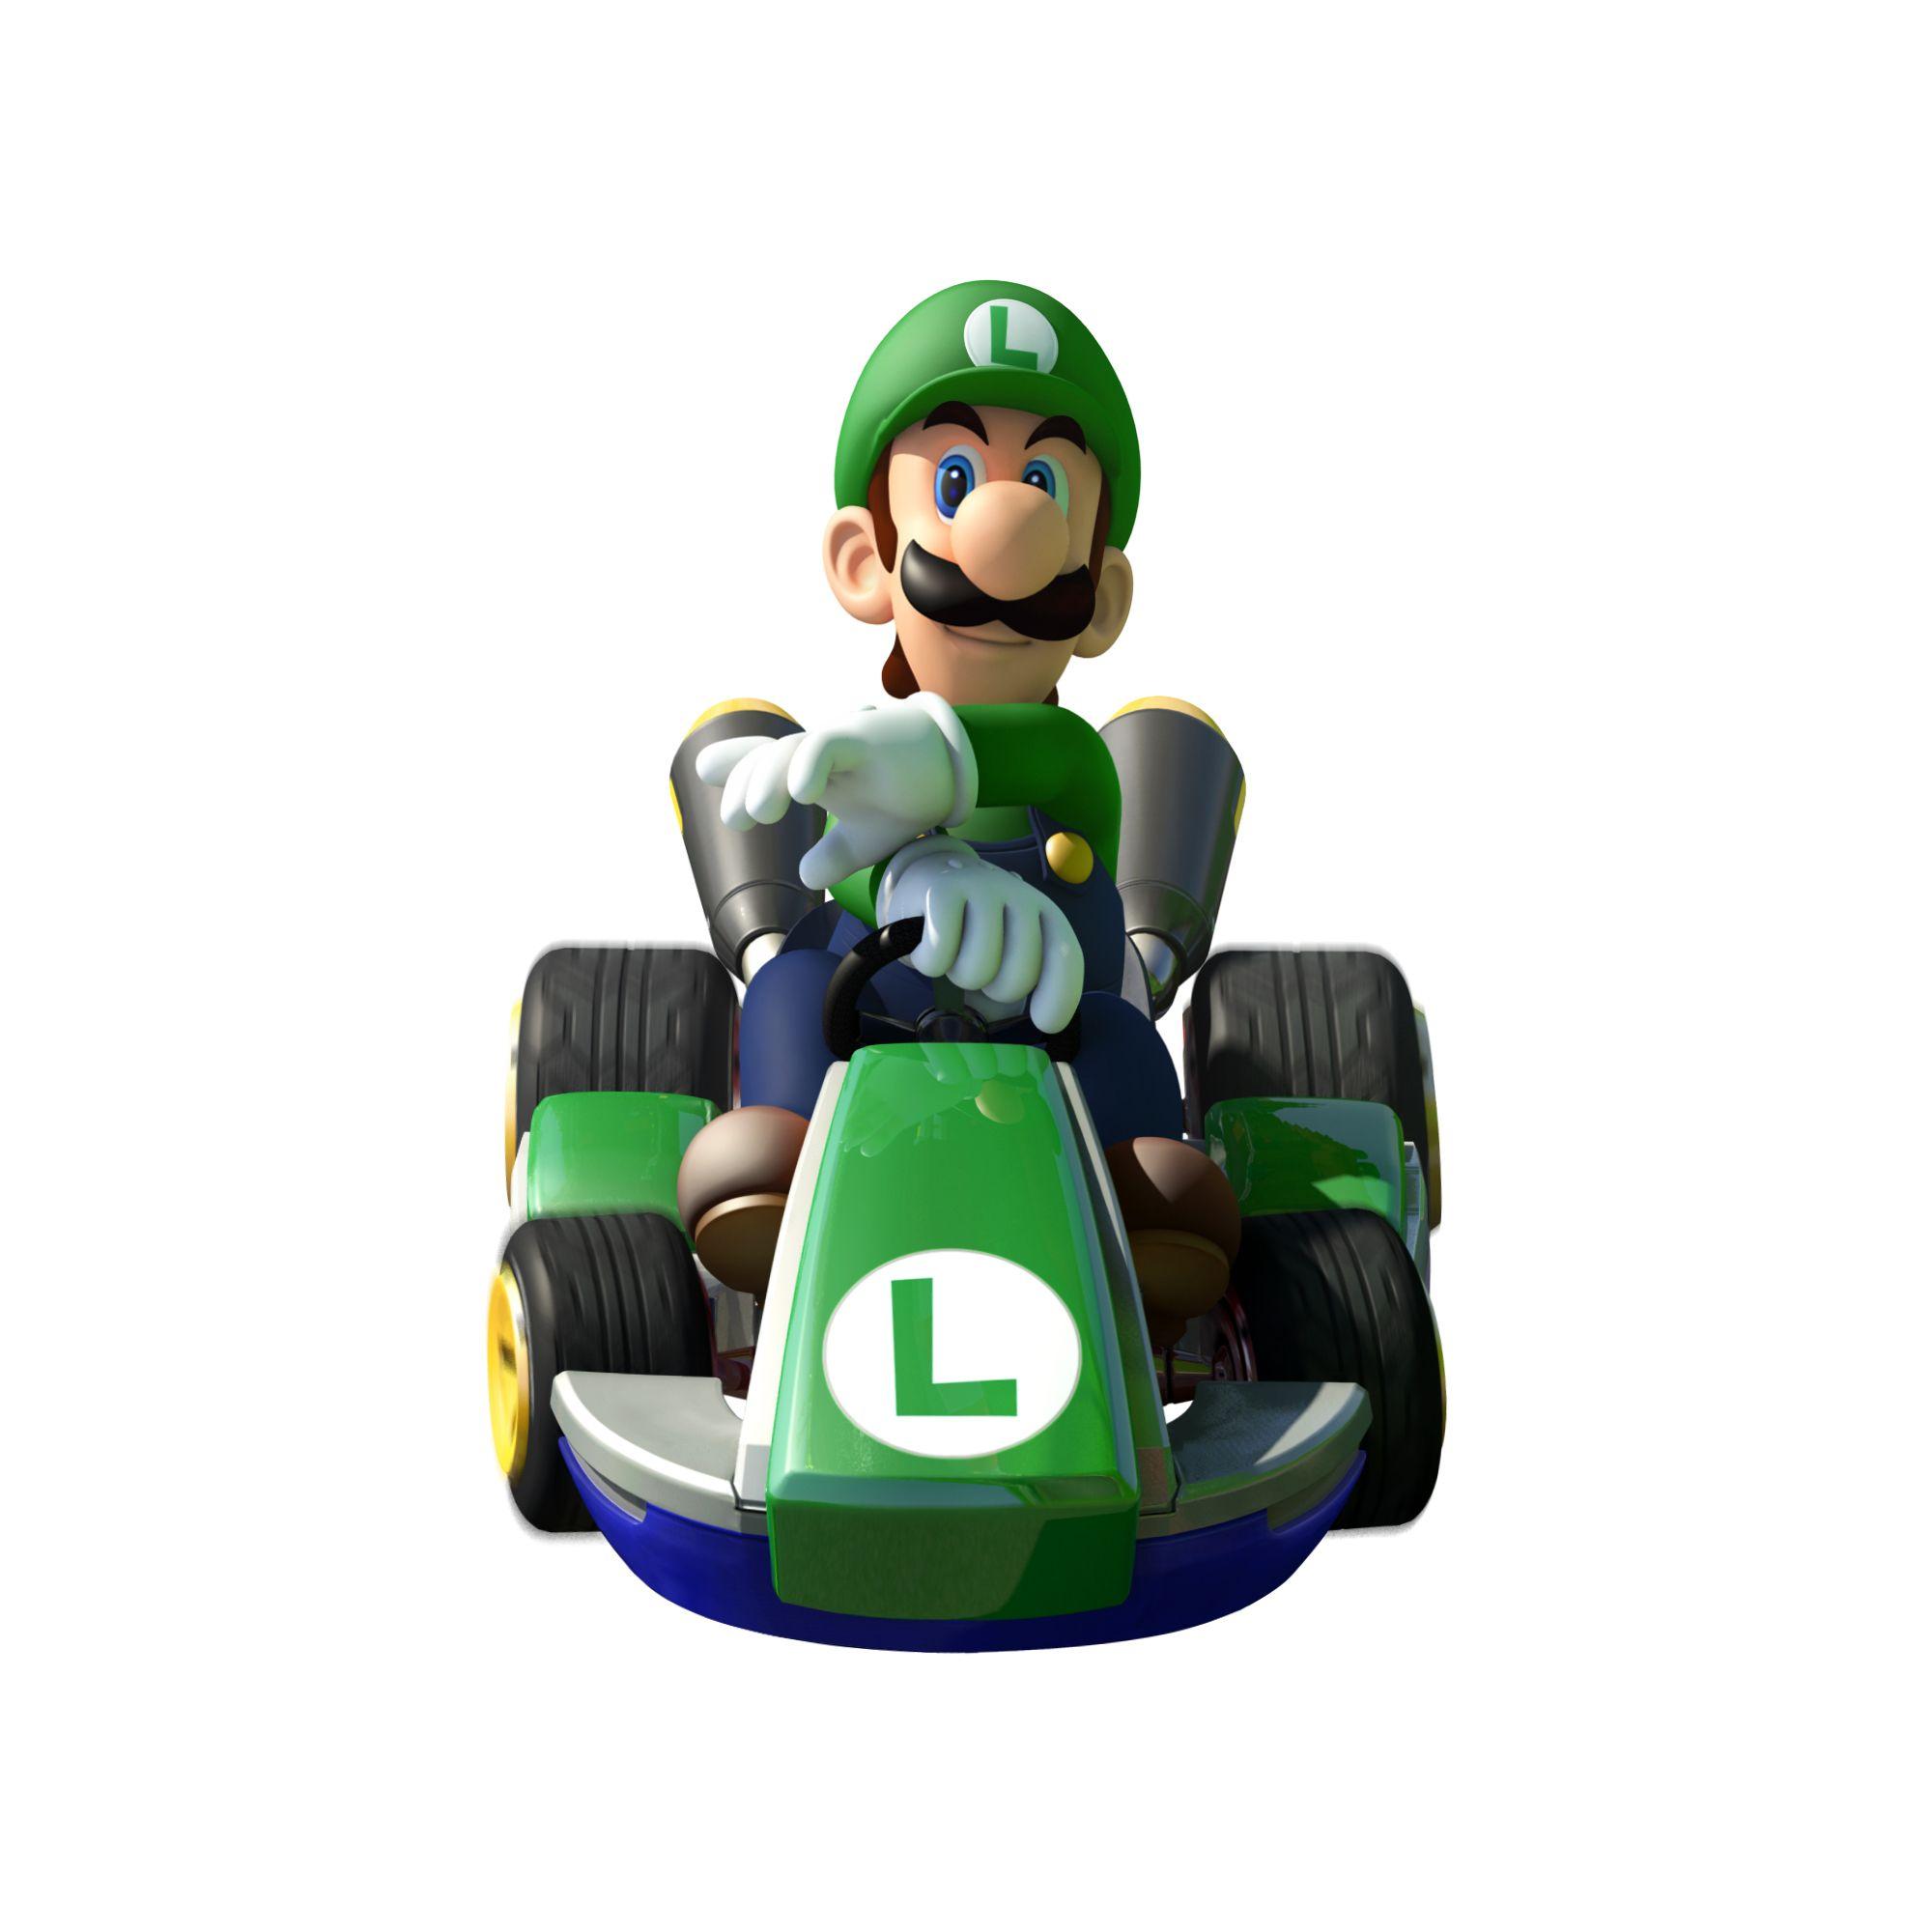 Mario Kart 8   Mario kart 8   Mario kart 8, Mario kart